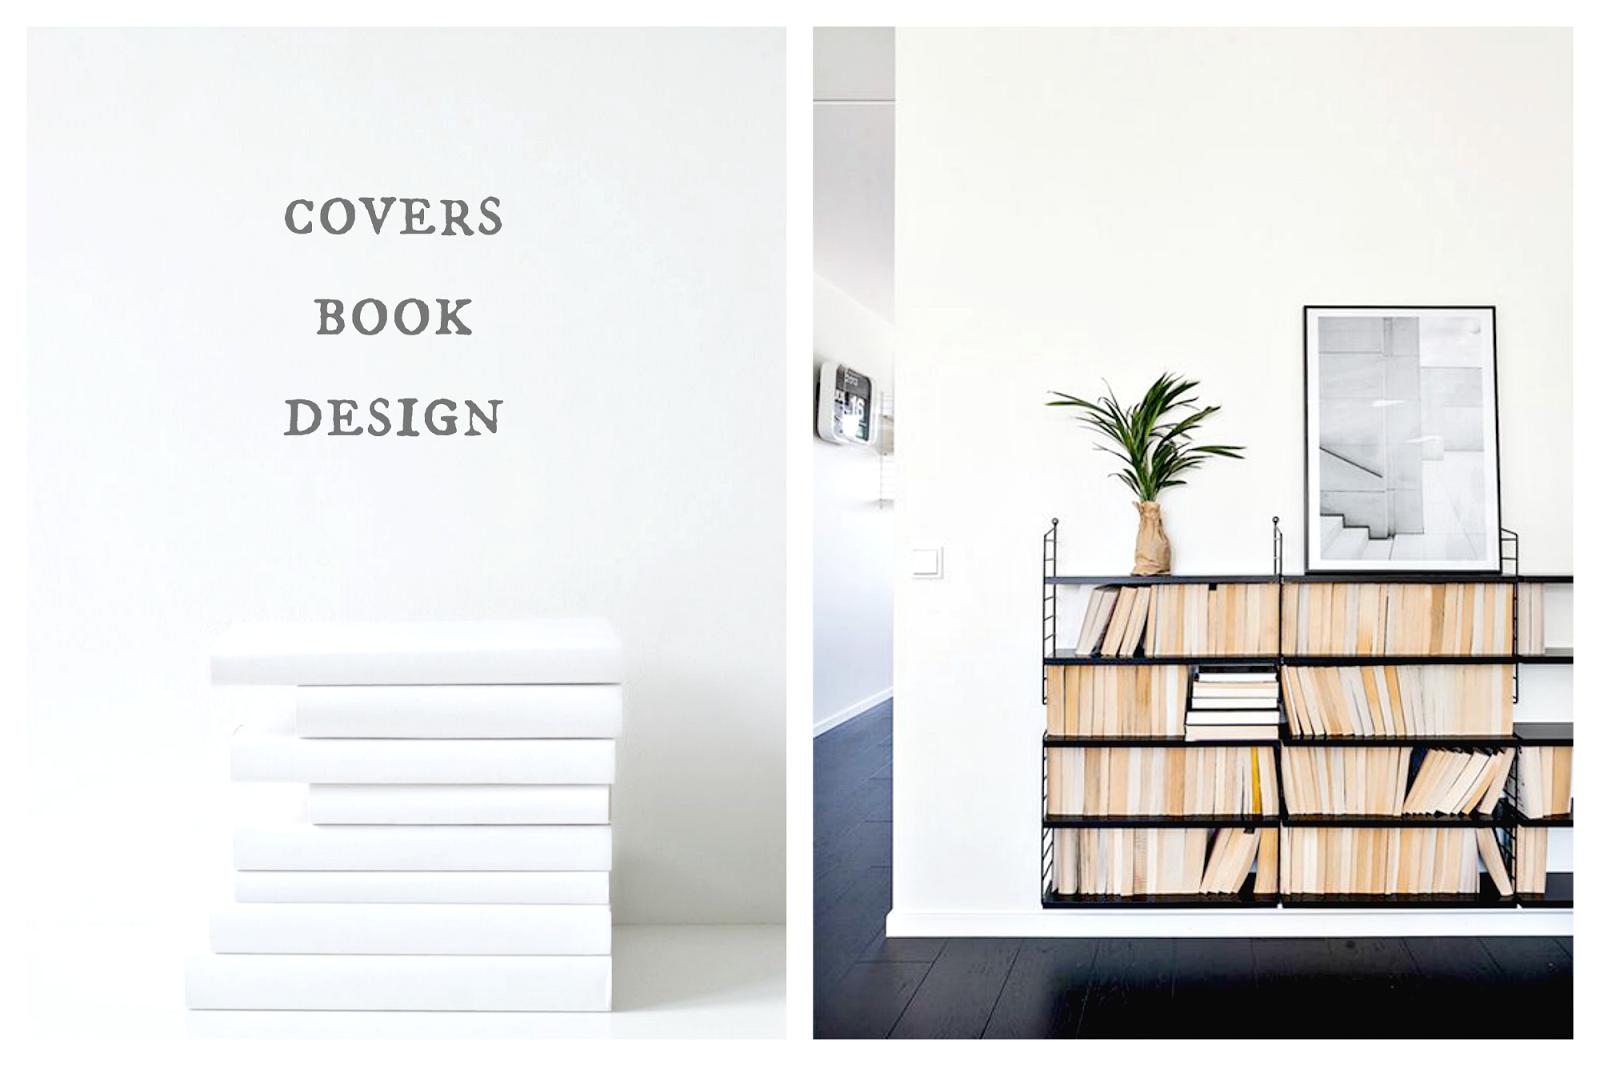 covers book design